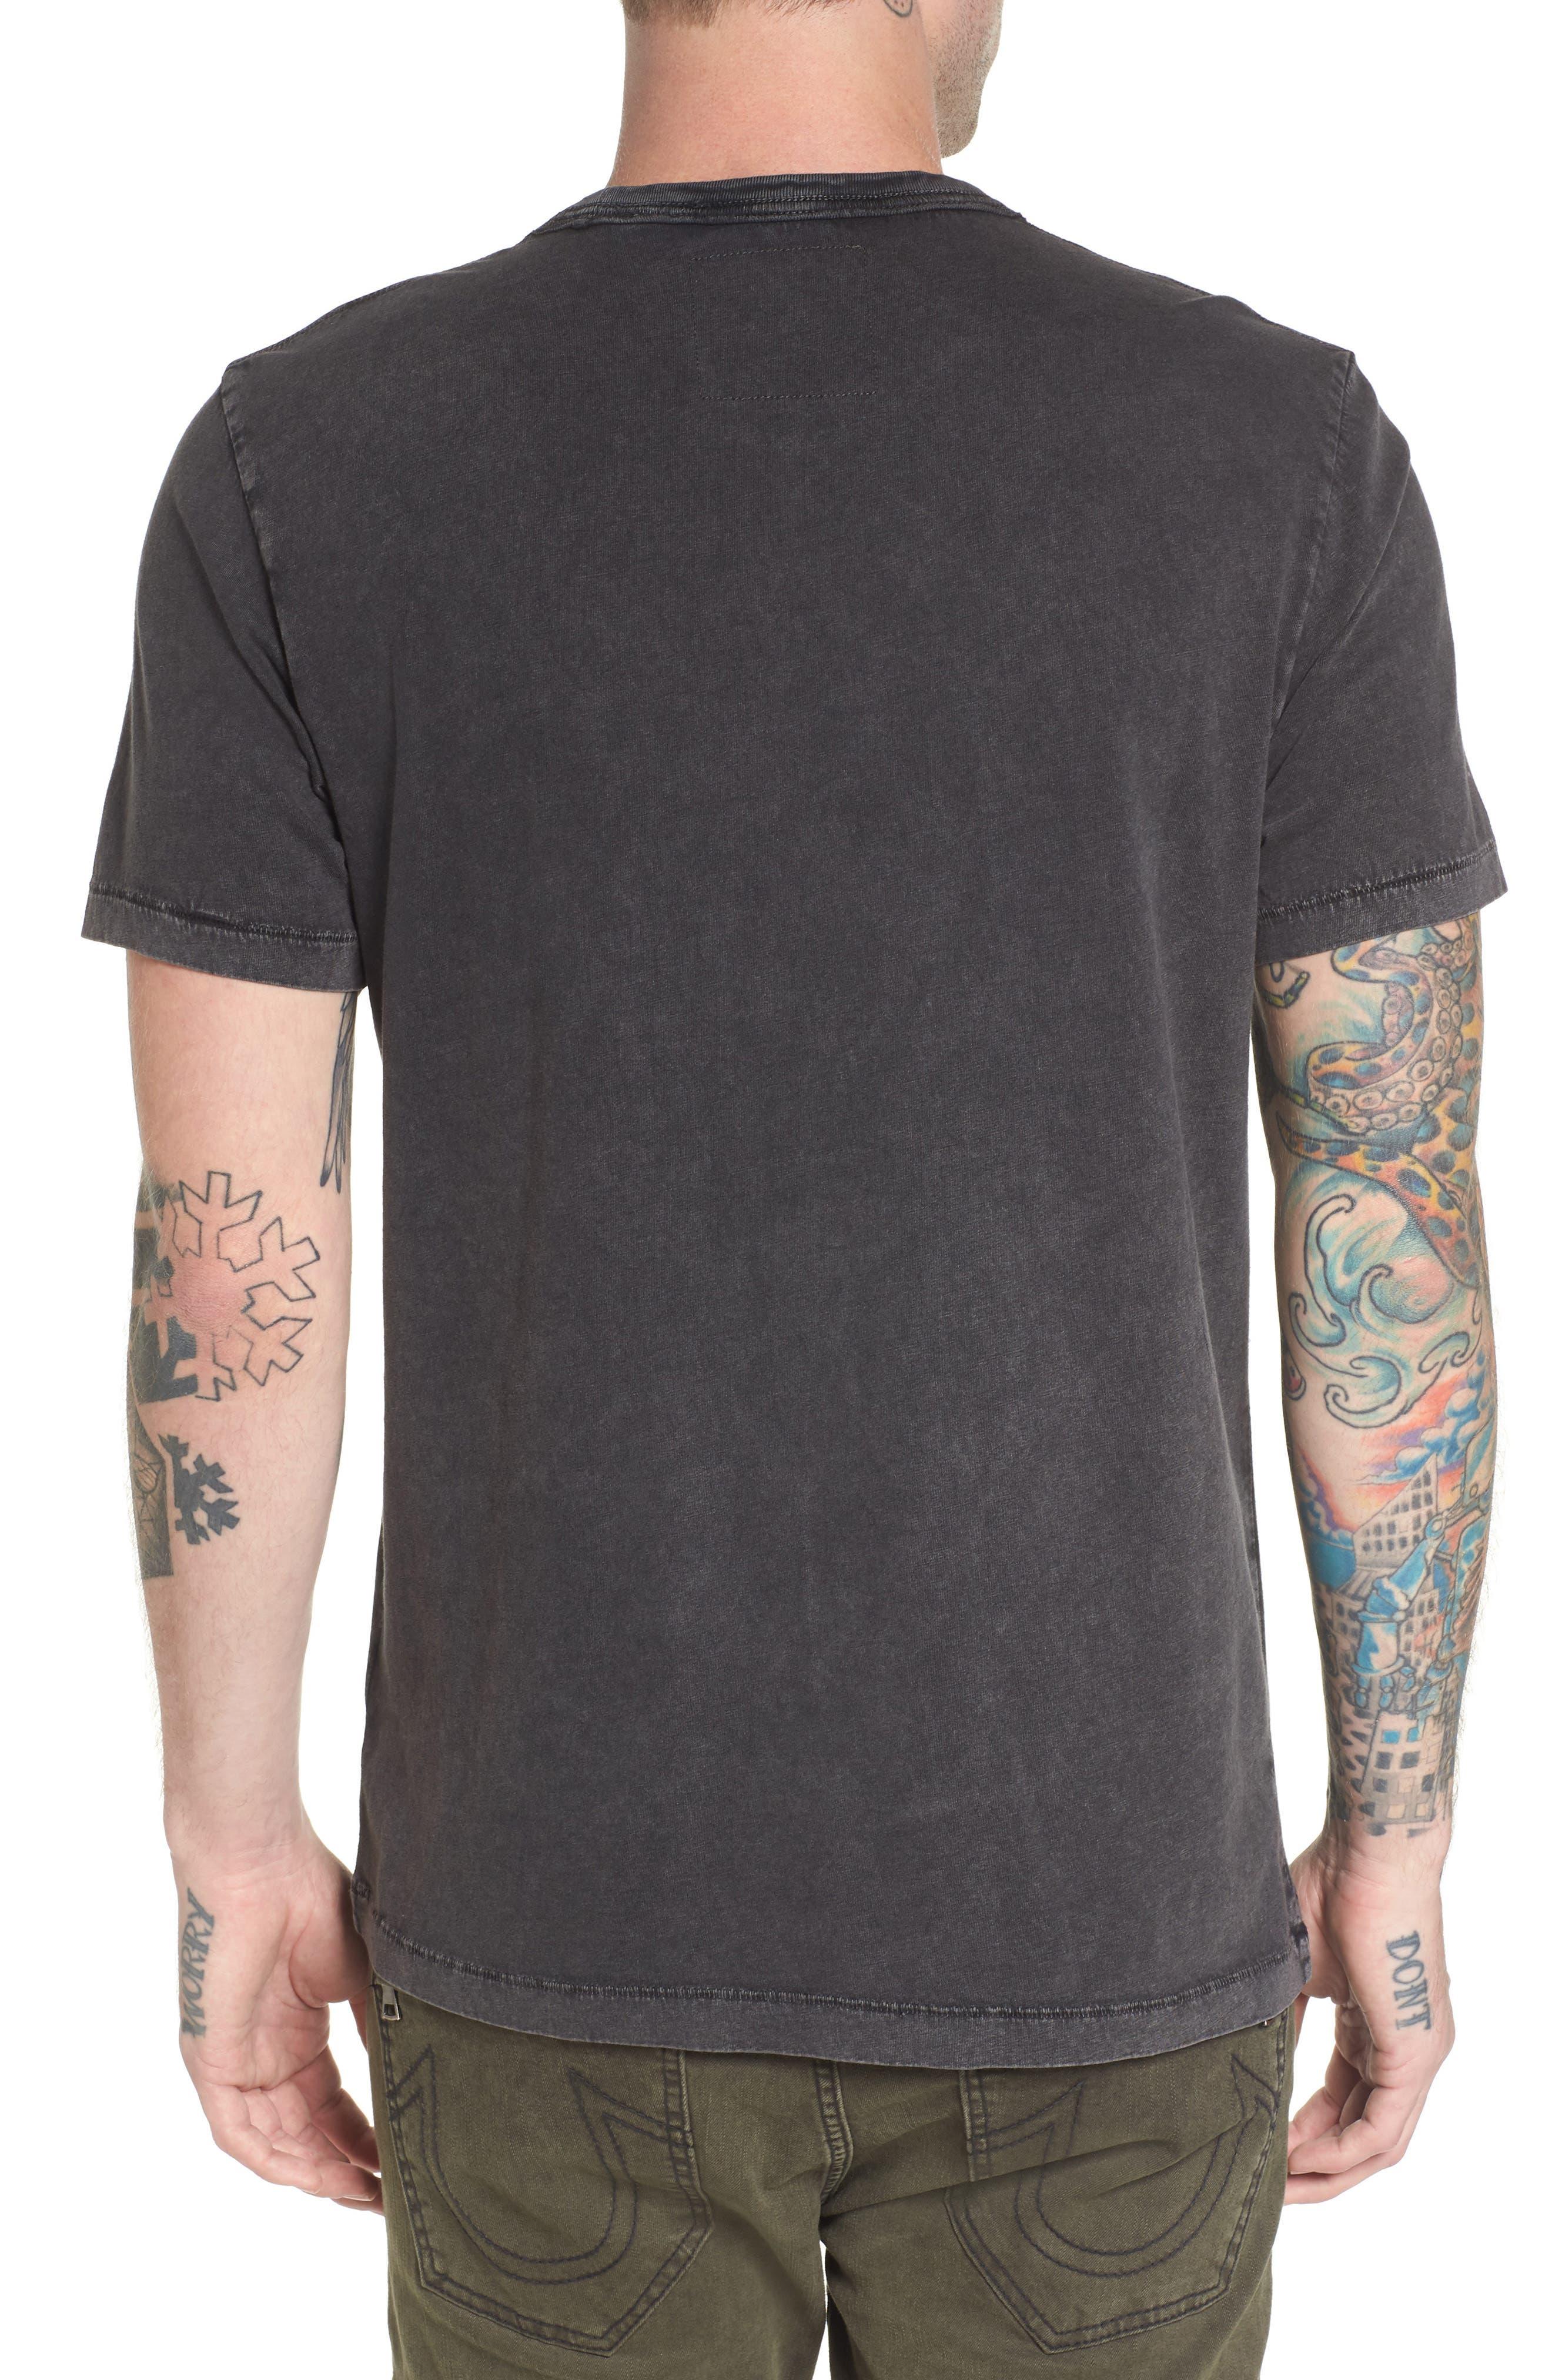 Dizzy Tour T-Shirt,                             Alternate thumbnail 2, color,                             Black